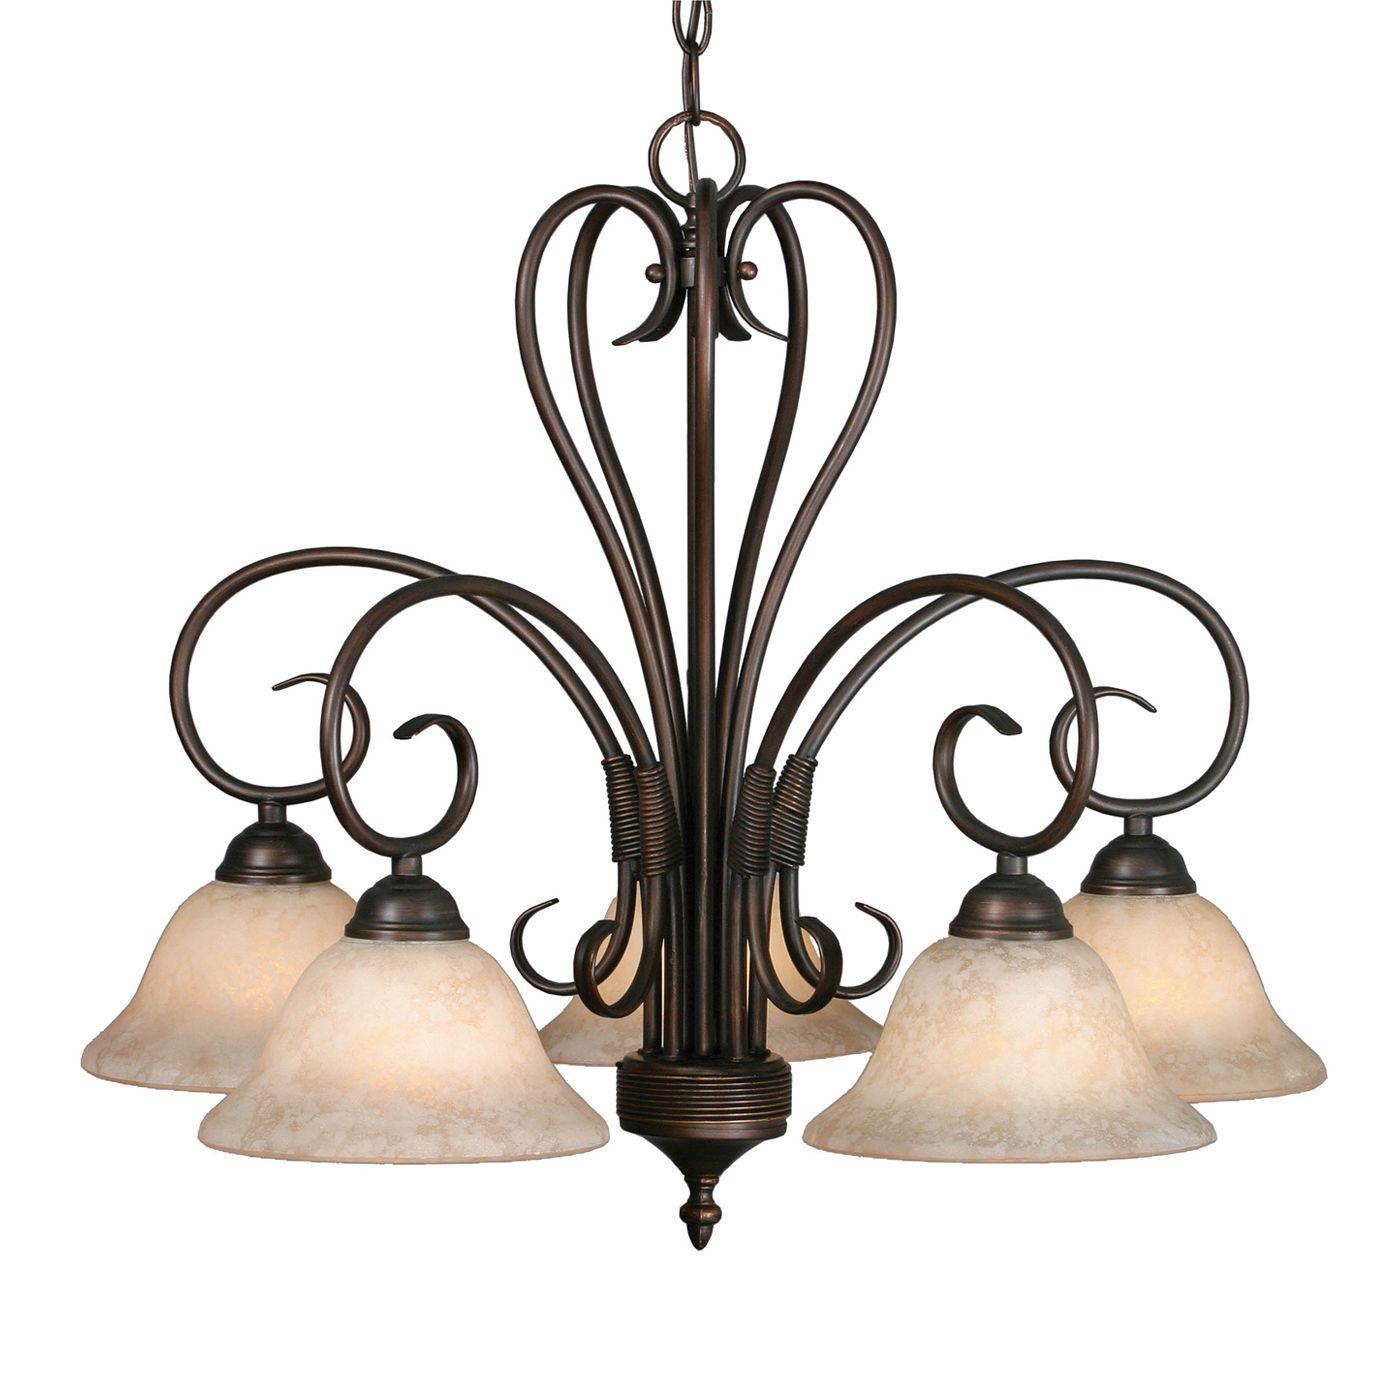 Golden Lighting 5 Light Homestead Downlight Chandelier Rubbed Bronze Golden Lighting Chandelier Shades Chandelier